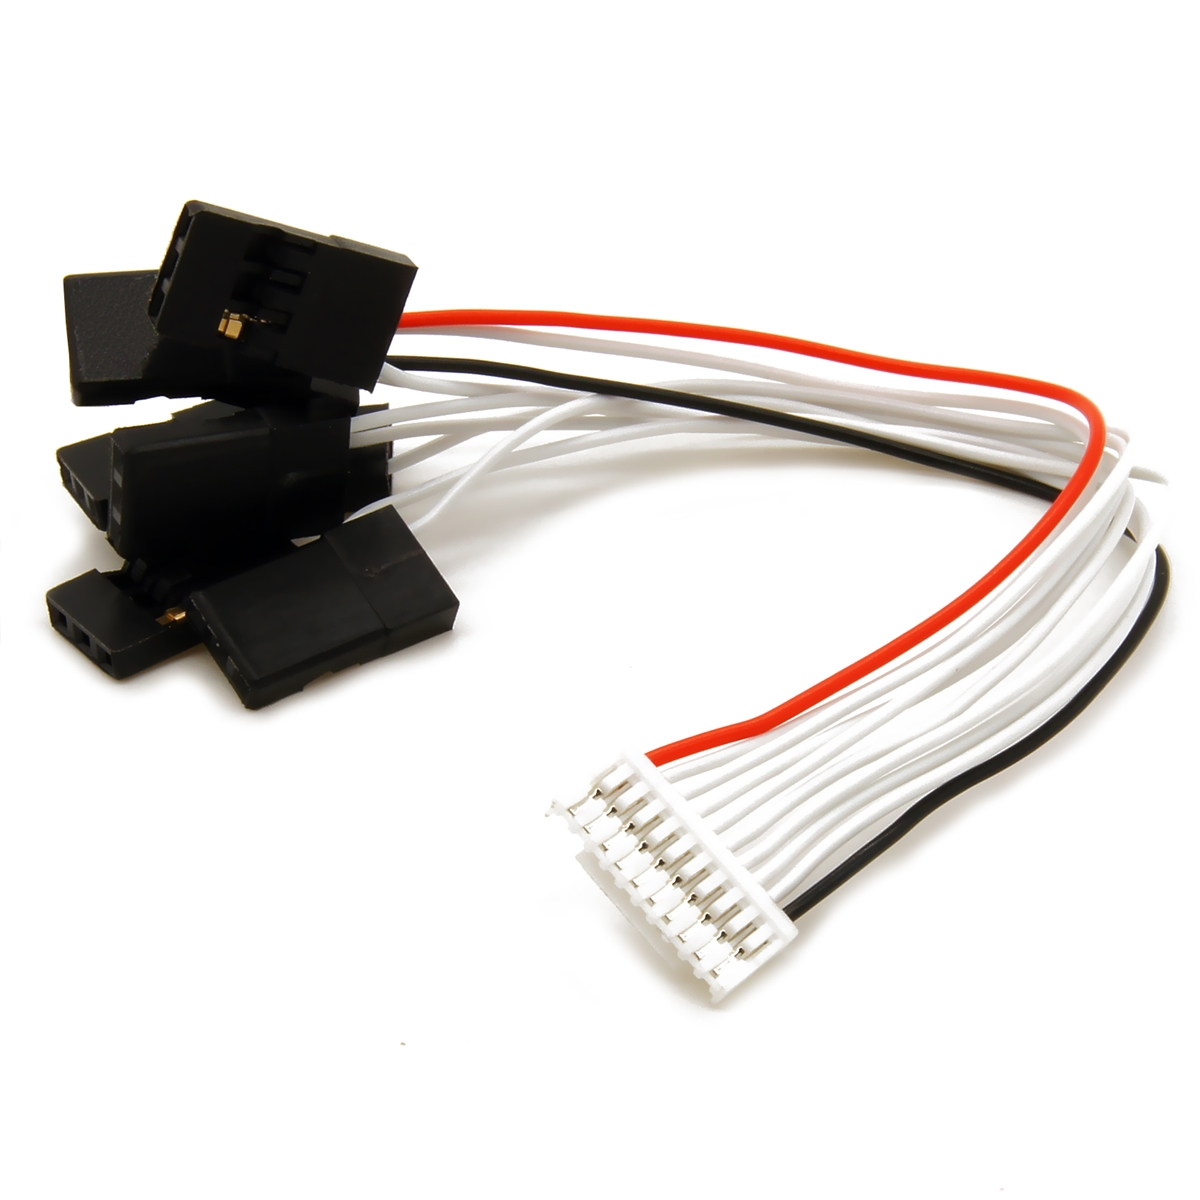 mRo 10-Pins JST-GH to 8 Individual JR Servo Plugs - MRC0210